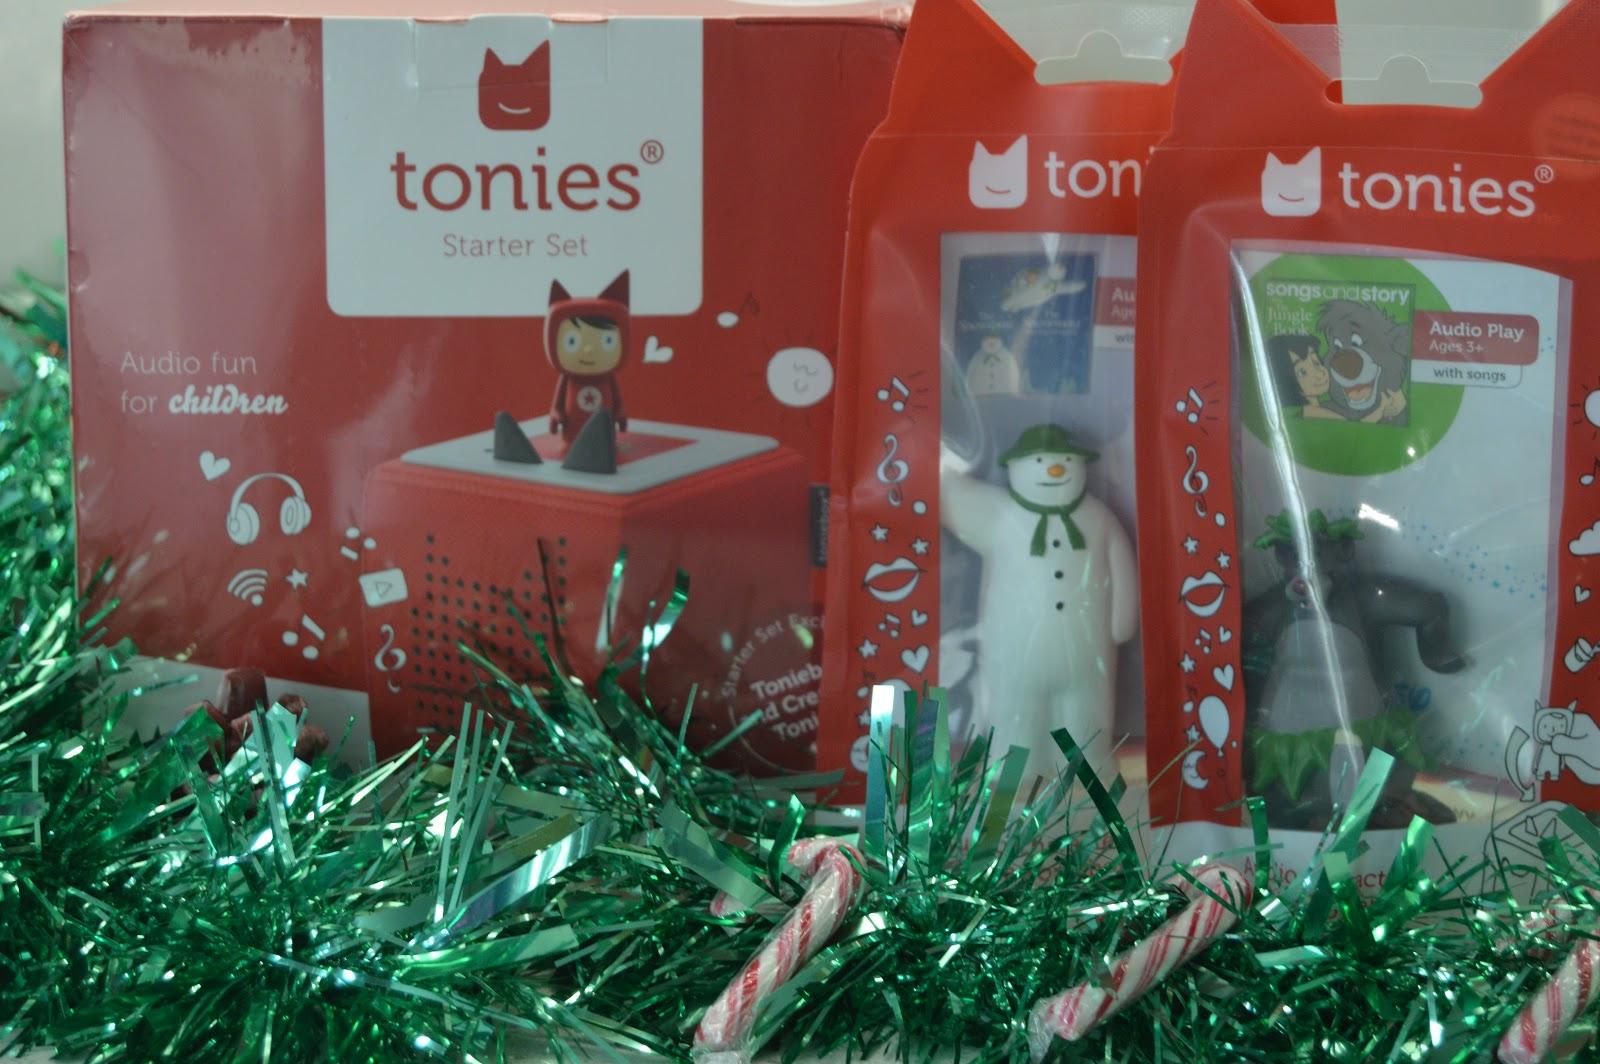 tonies box and tonies figures